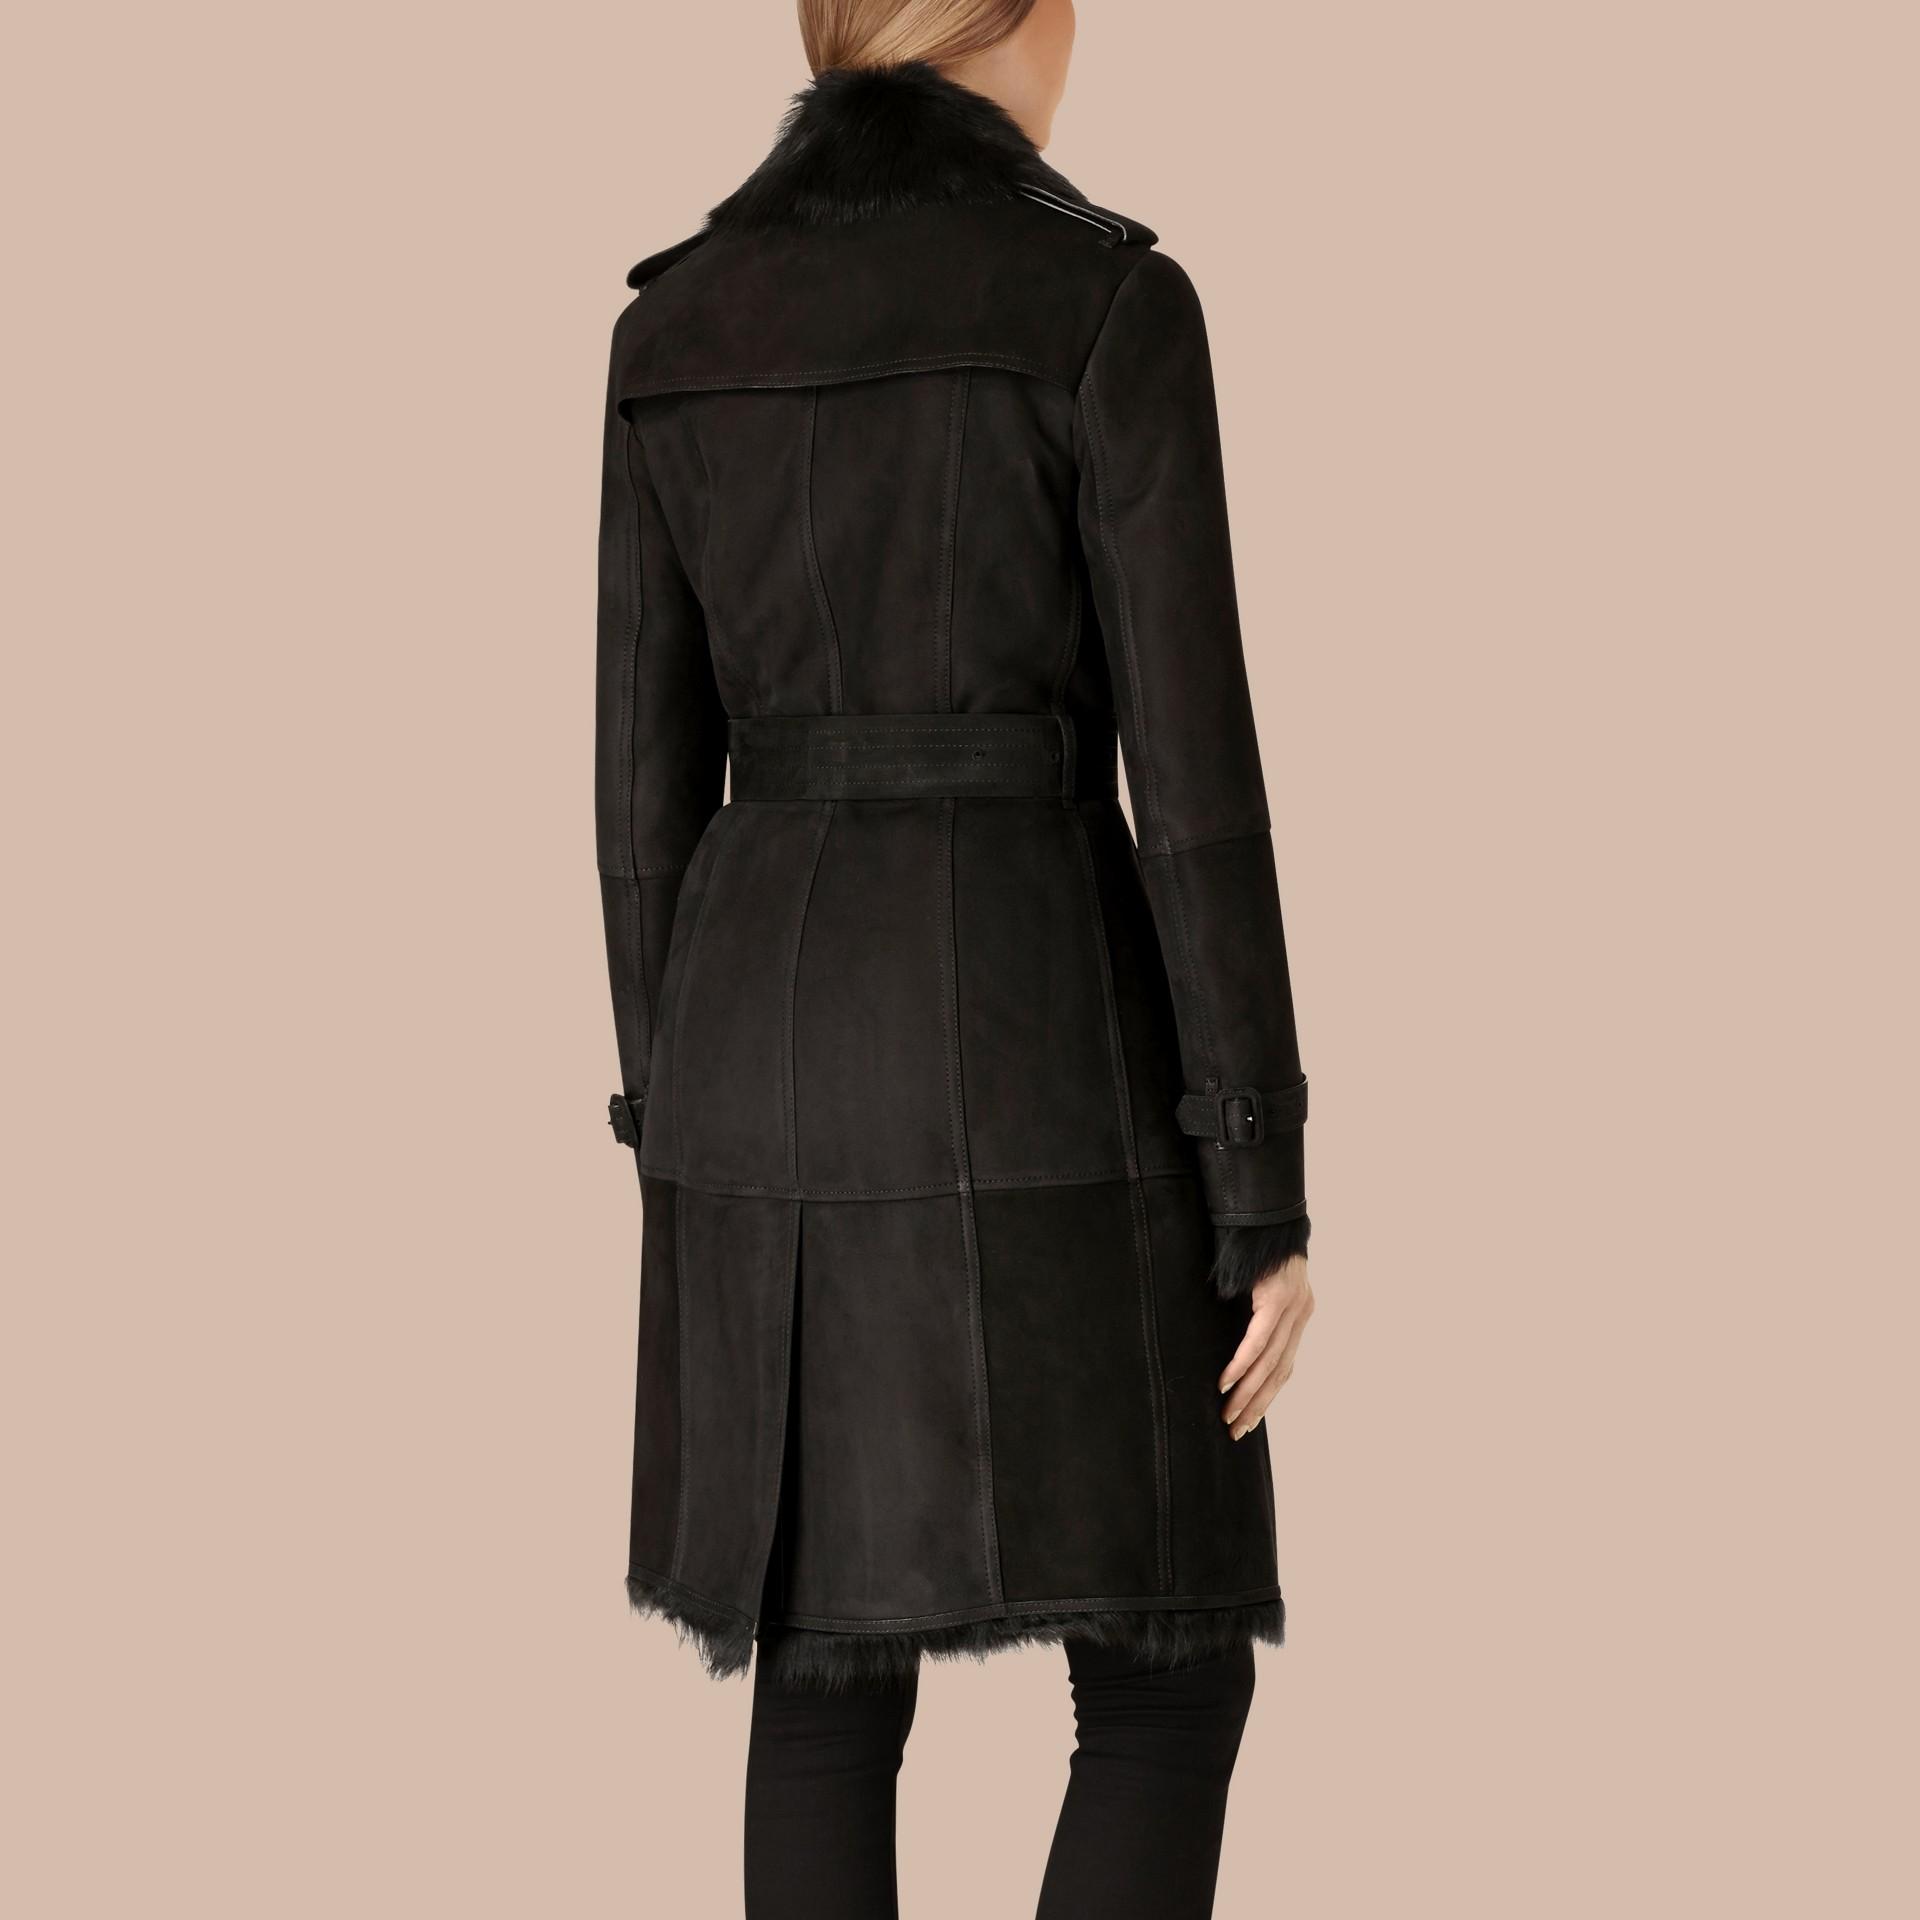 Noir Trench-coat en shearling Noir - photo de la galerie 4